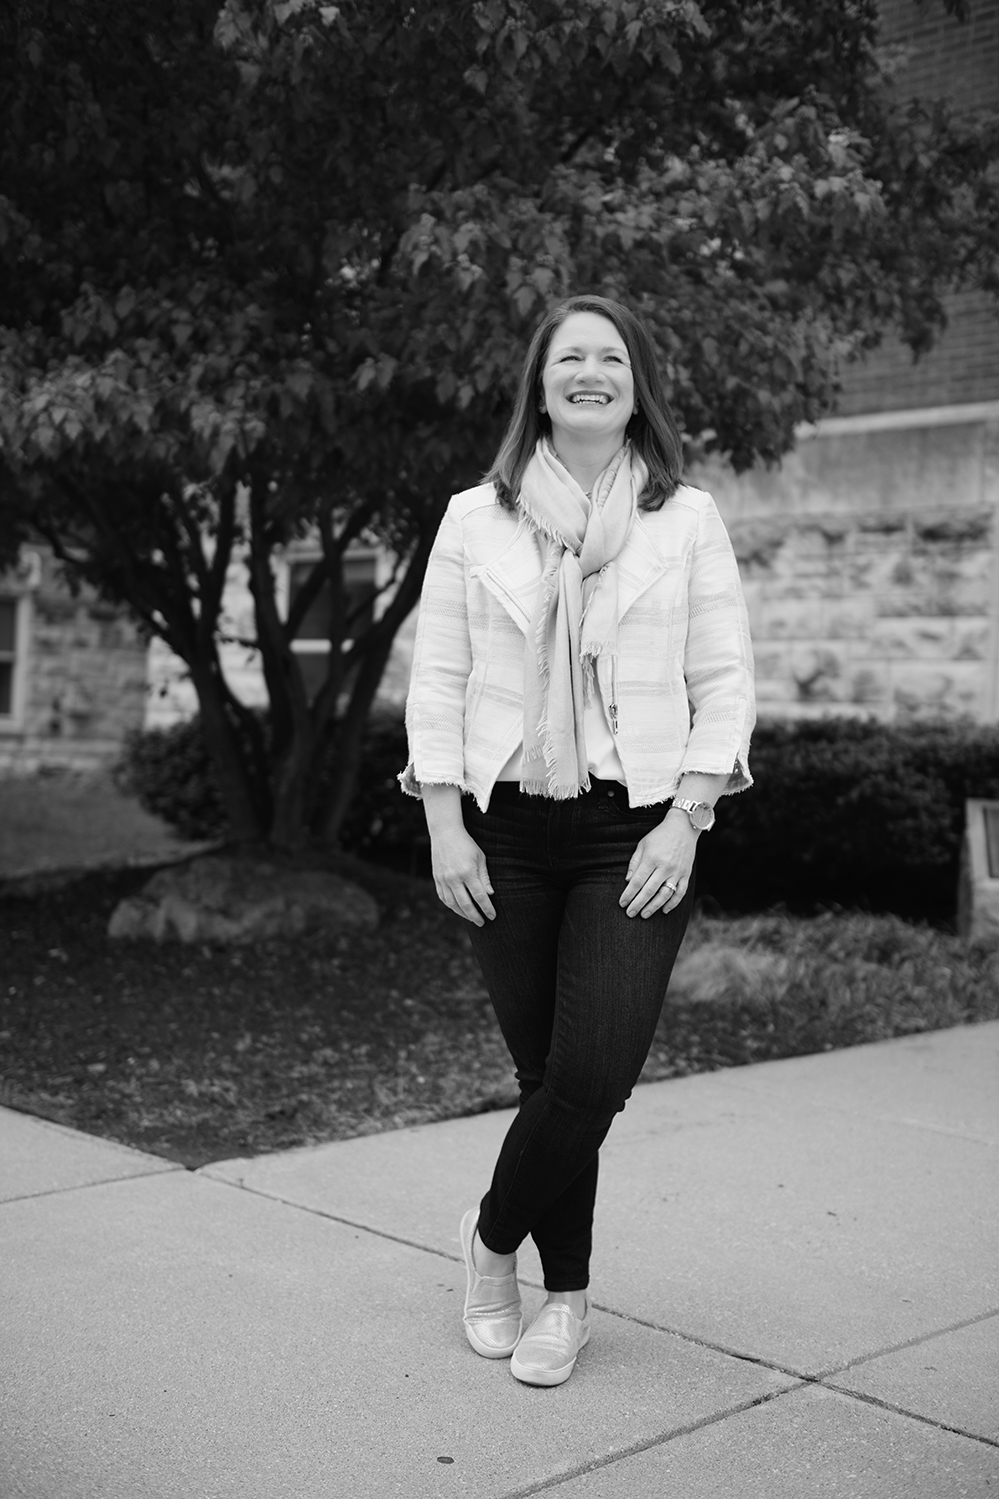 Katie Gilmore - Founder and CEOKSGilmore Consulting LLCkatie@ksgilmore.com